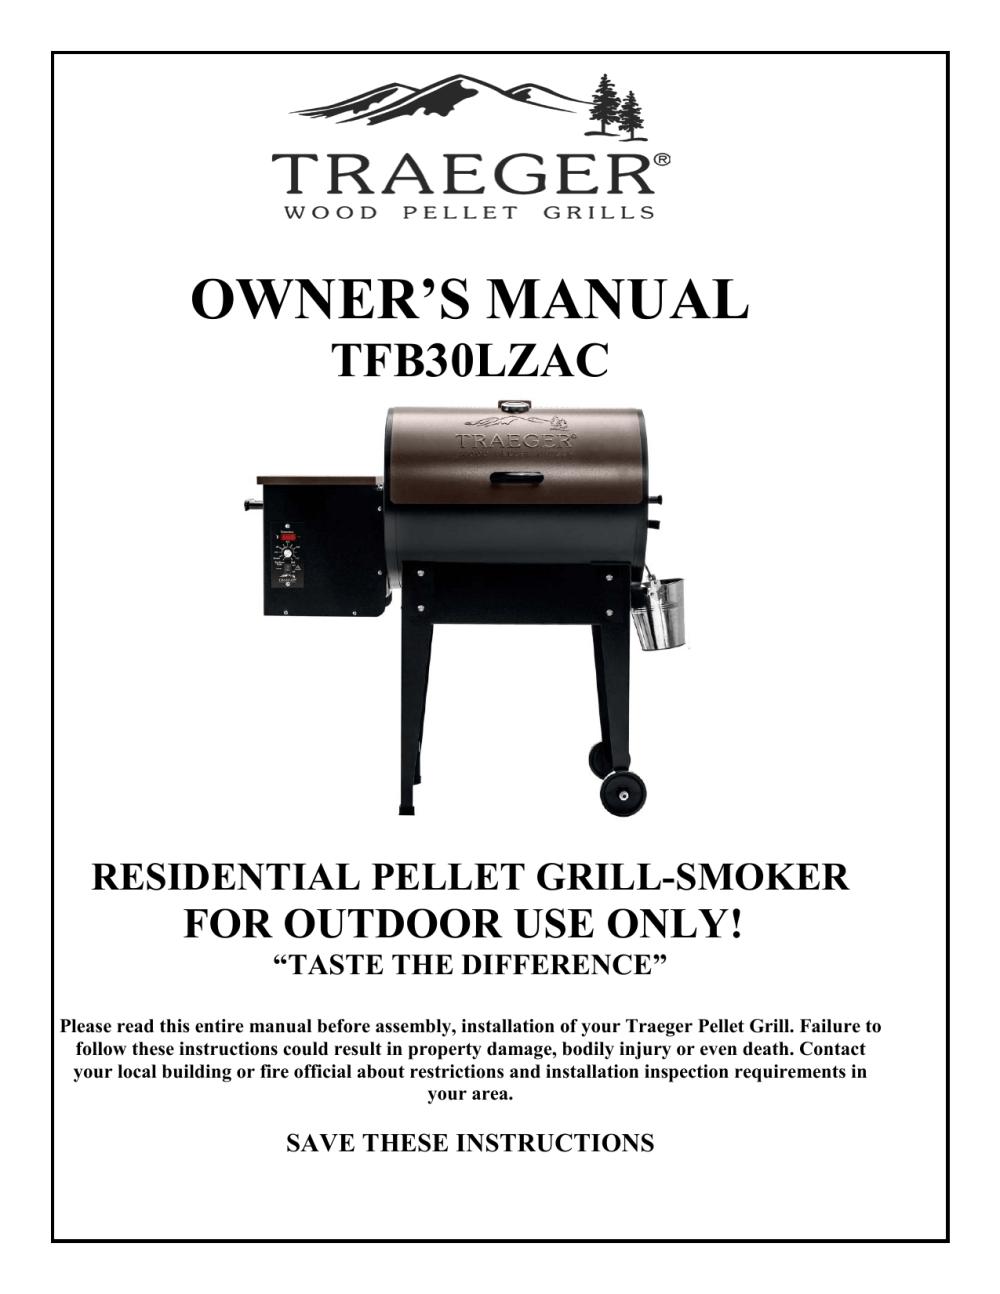 medium resolution of owner s manual traeger wood pellet grills